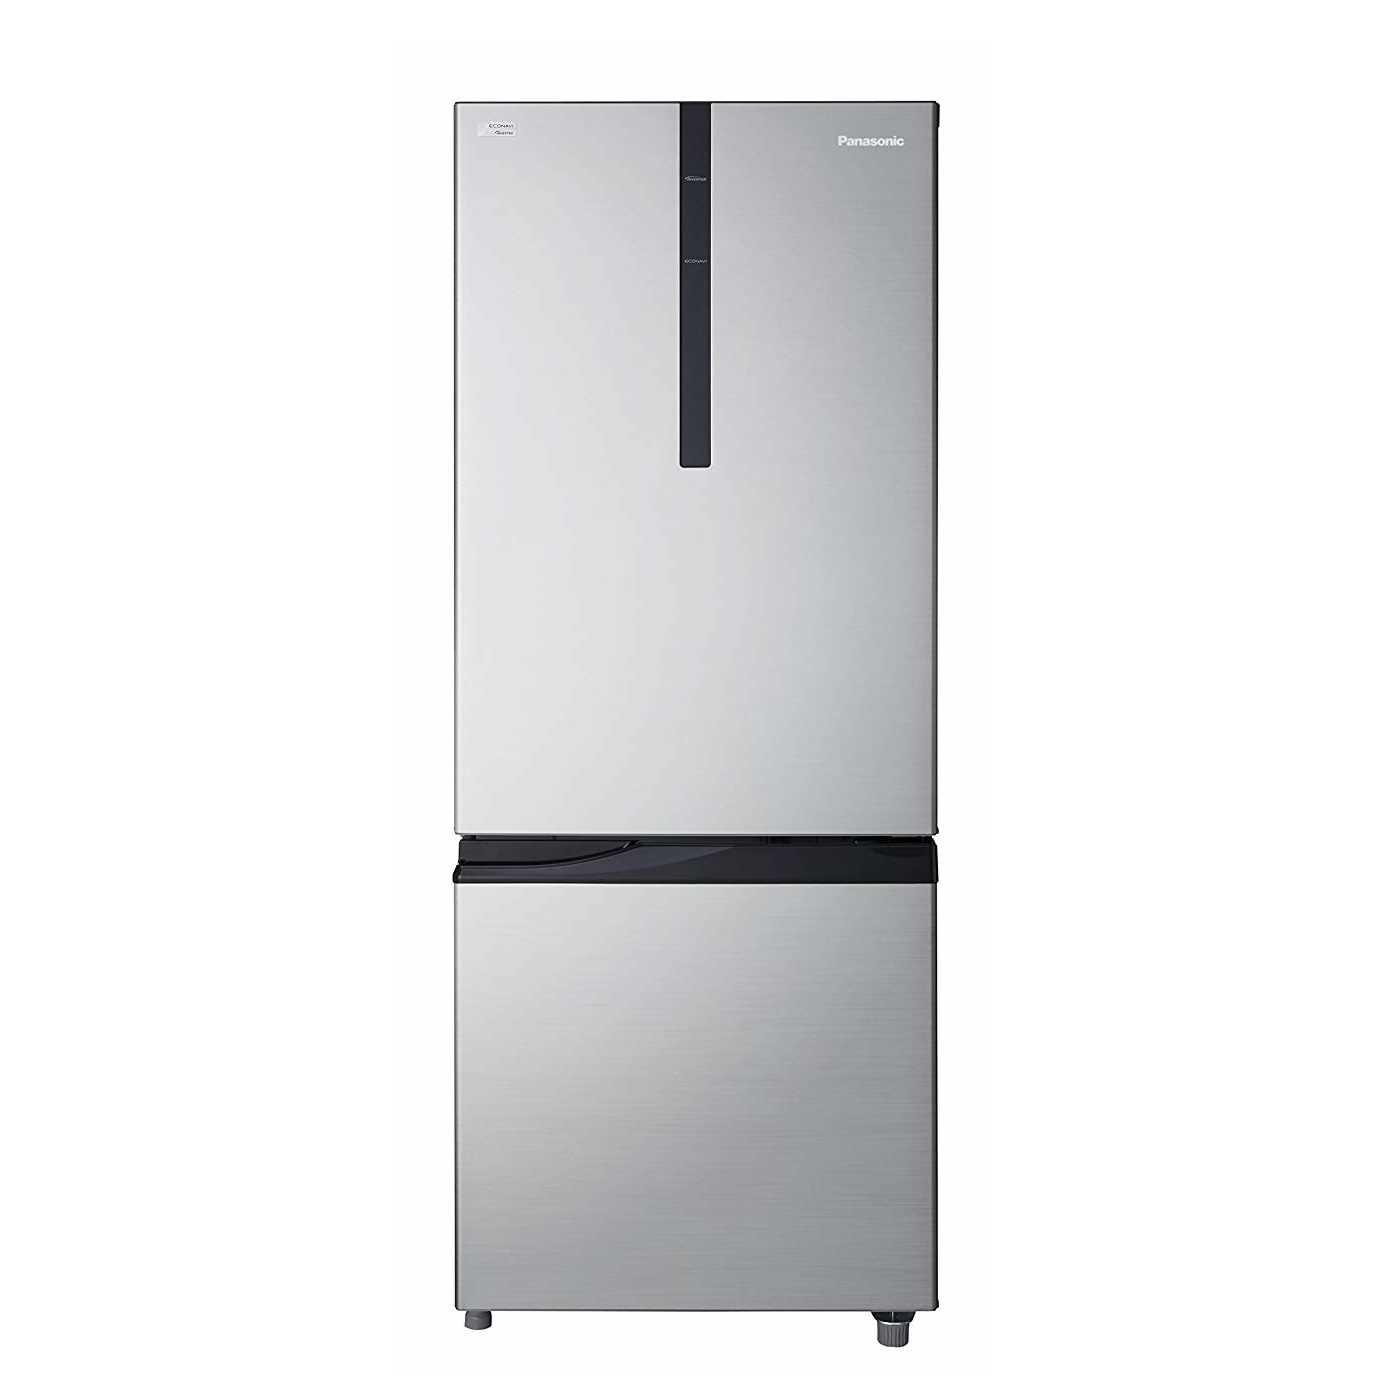 Panasonic NR BR307RSX1 296 Litre Frost Free Double Door Refrigerator